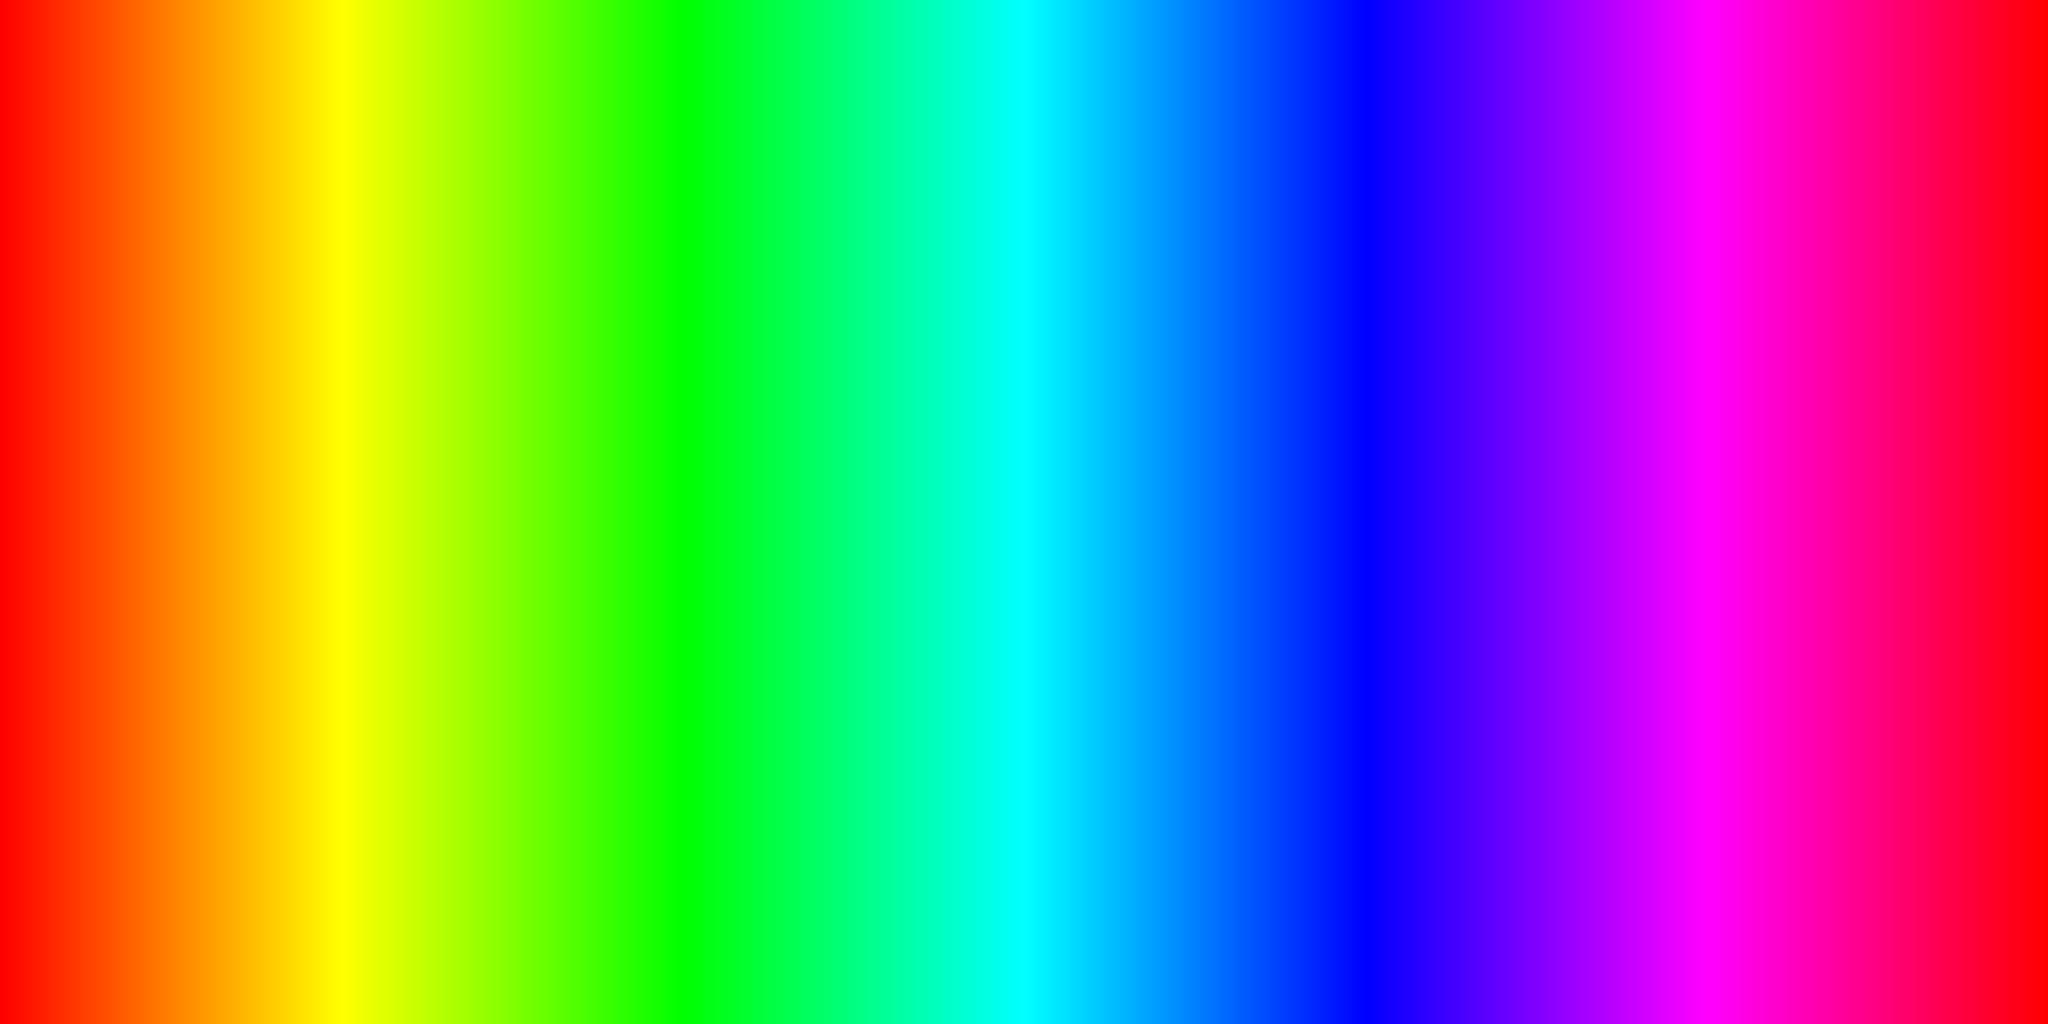 Alpha compositing   Wikipedia 2048x1024